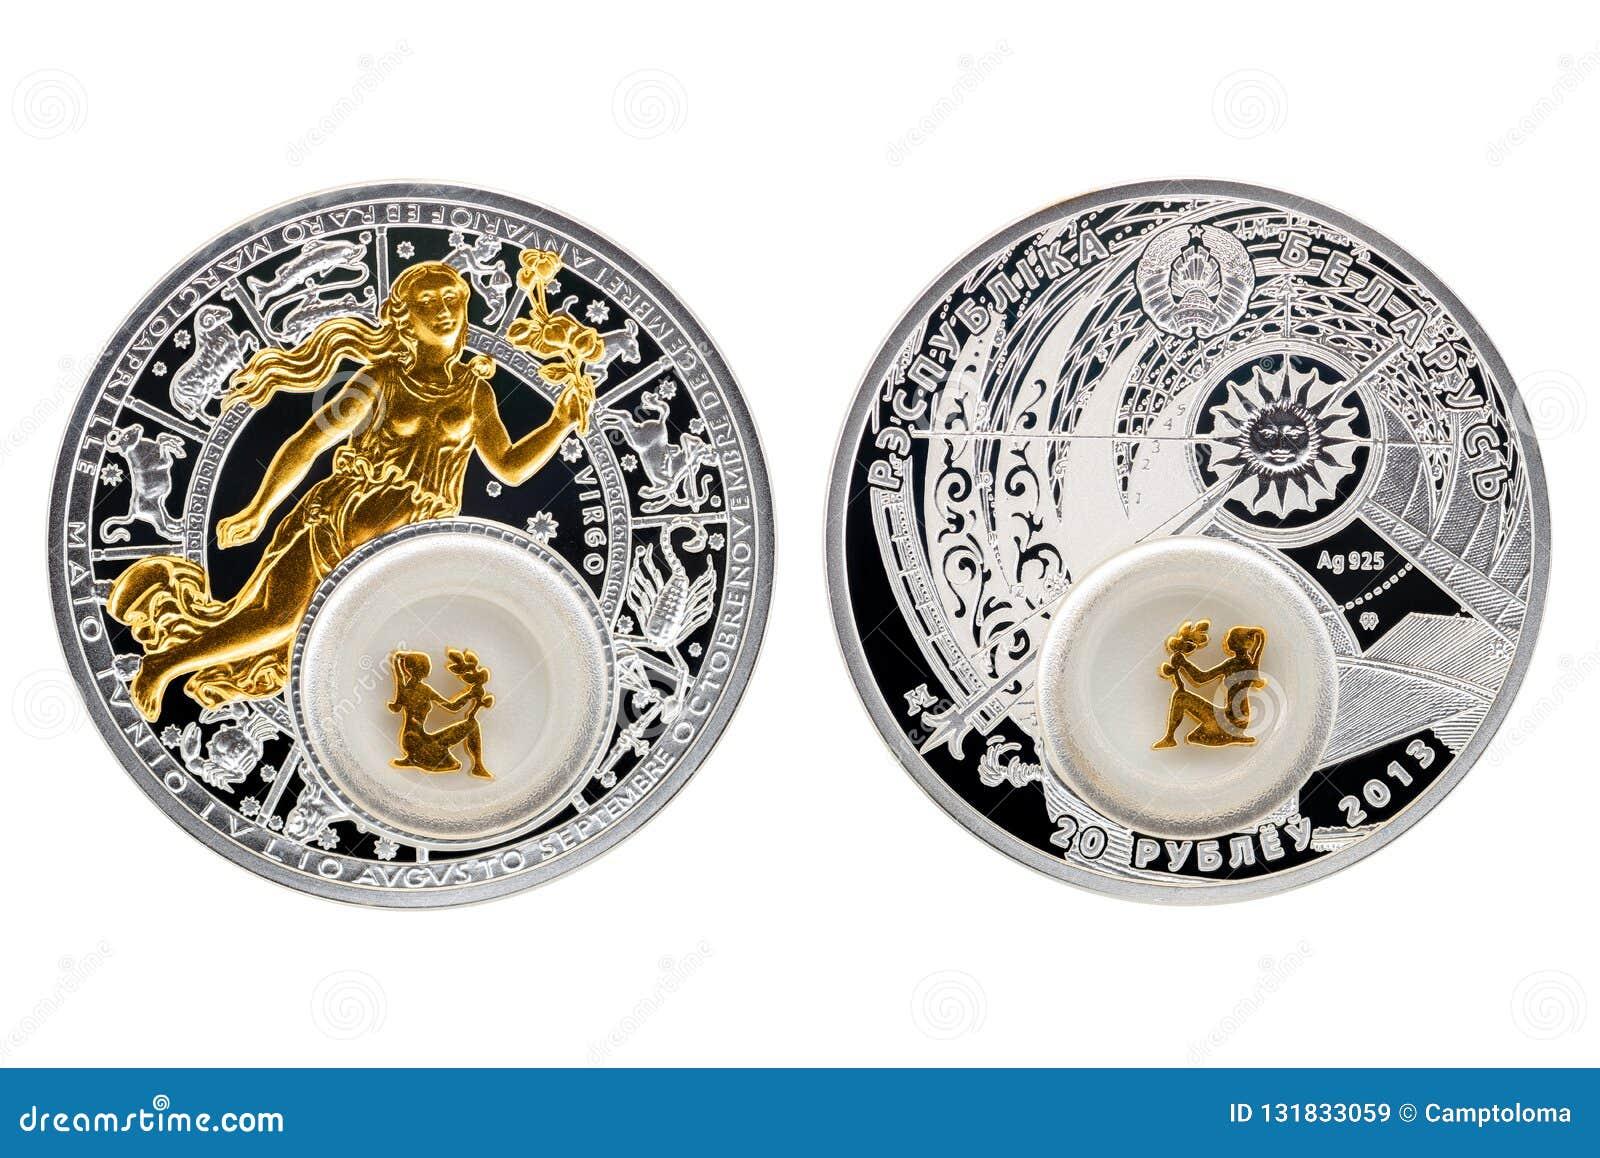 Belarus silver coin astrology Virgo